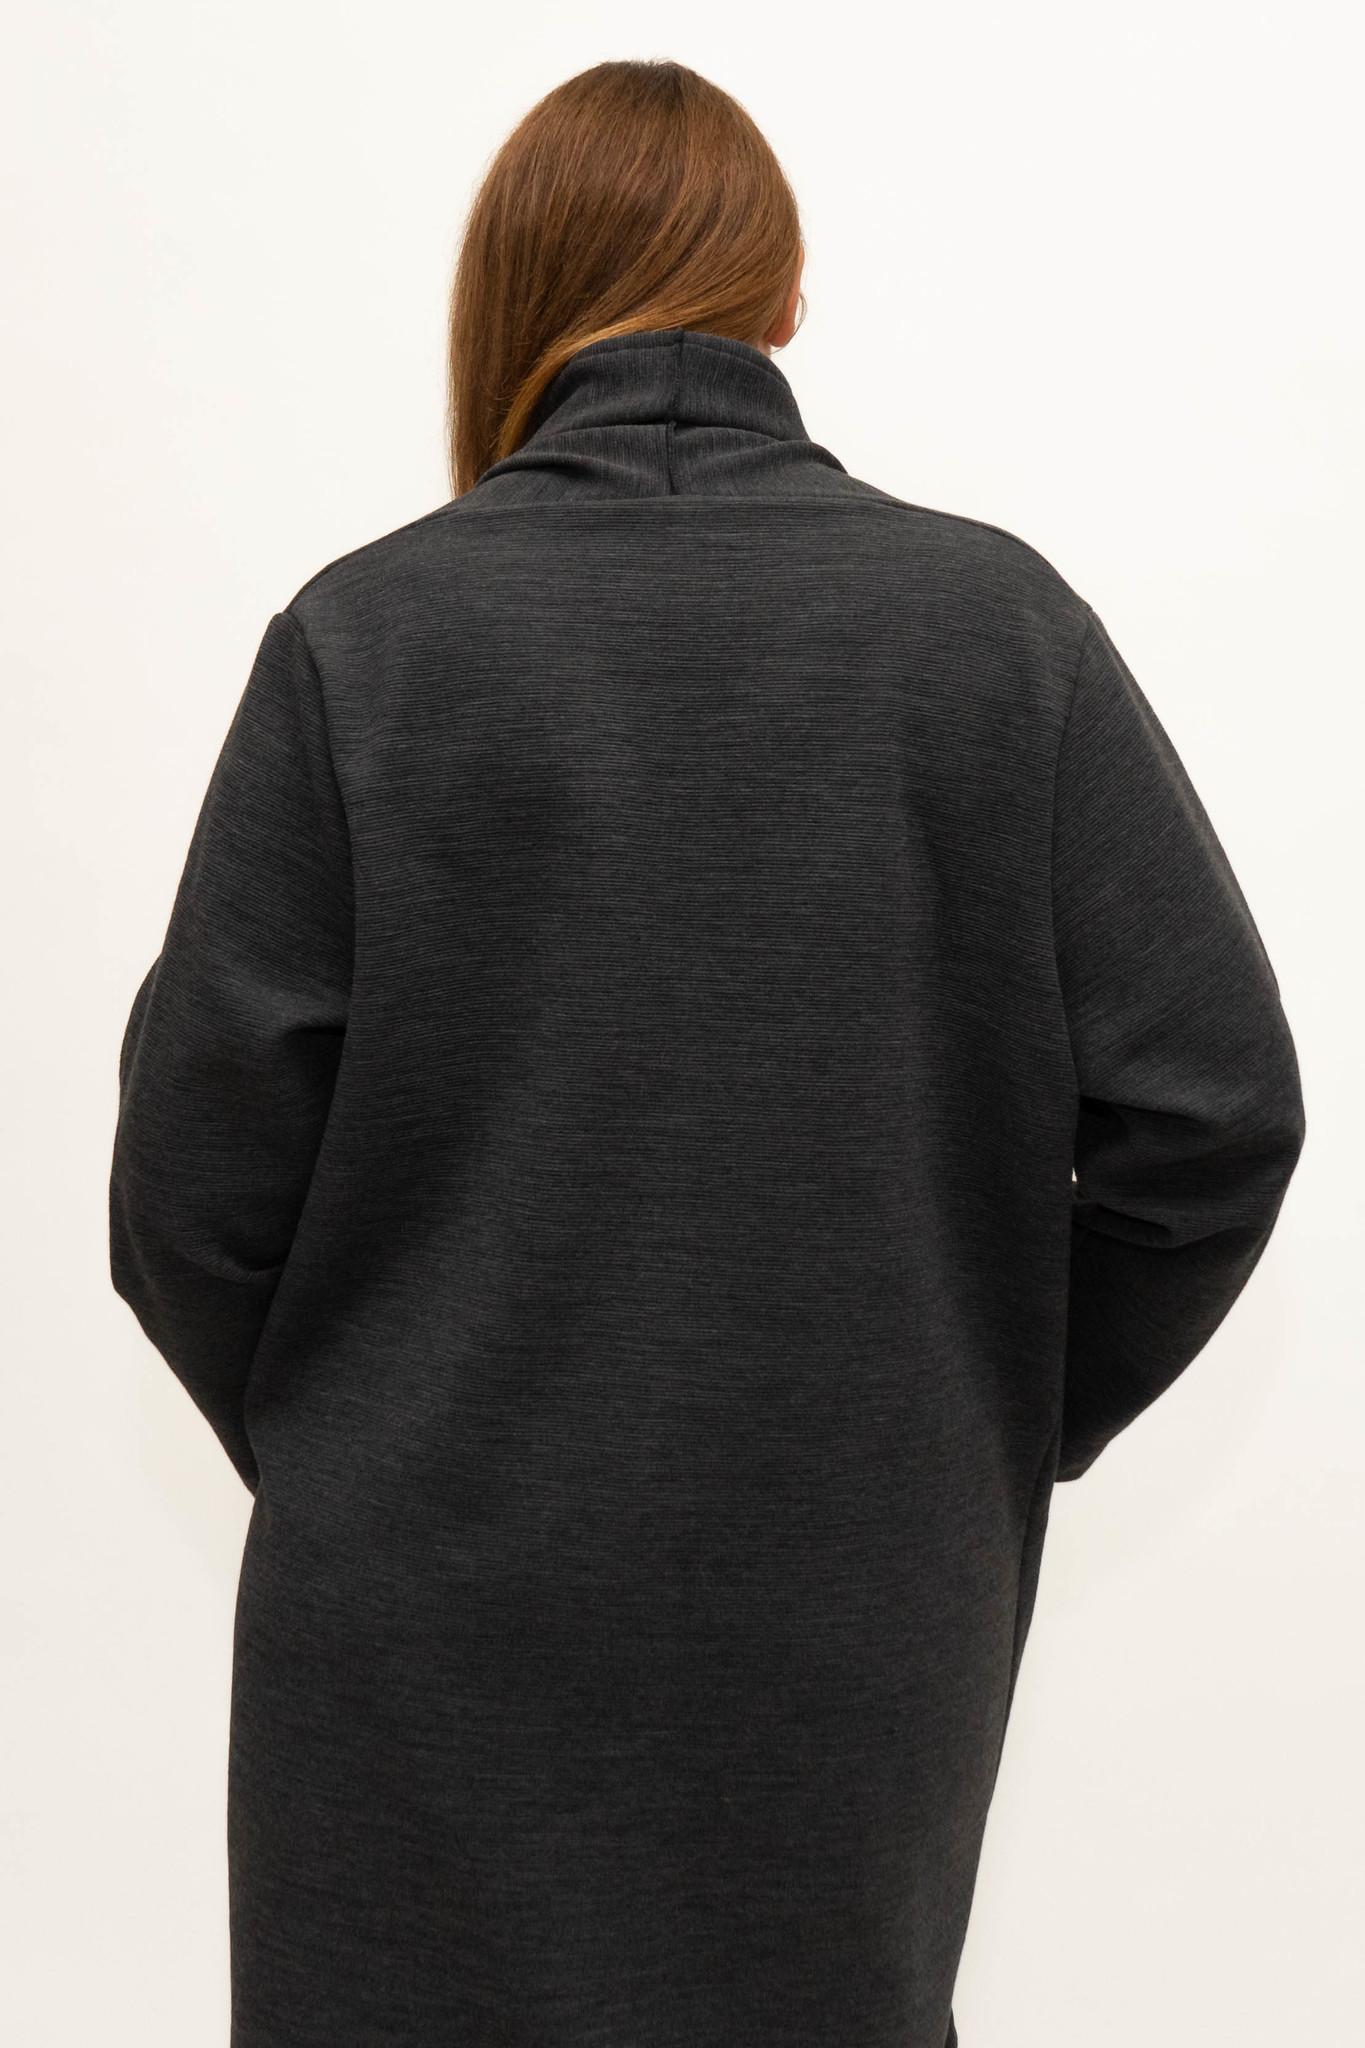 PHILIA Cardigan in Polyester-Virgin Wool blend-4